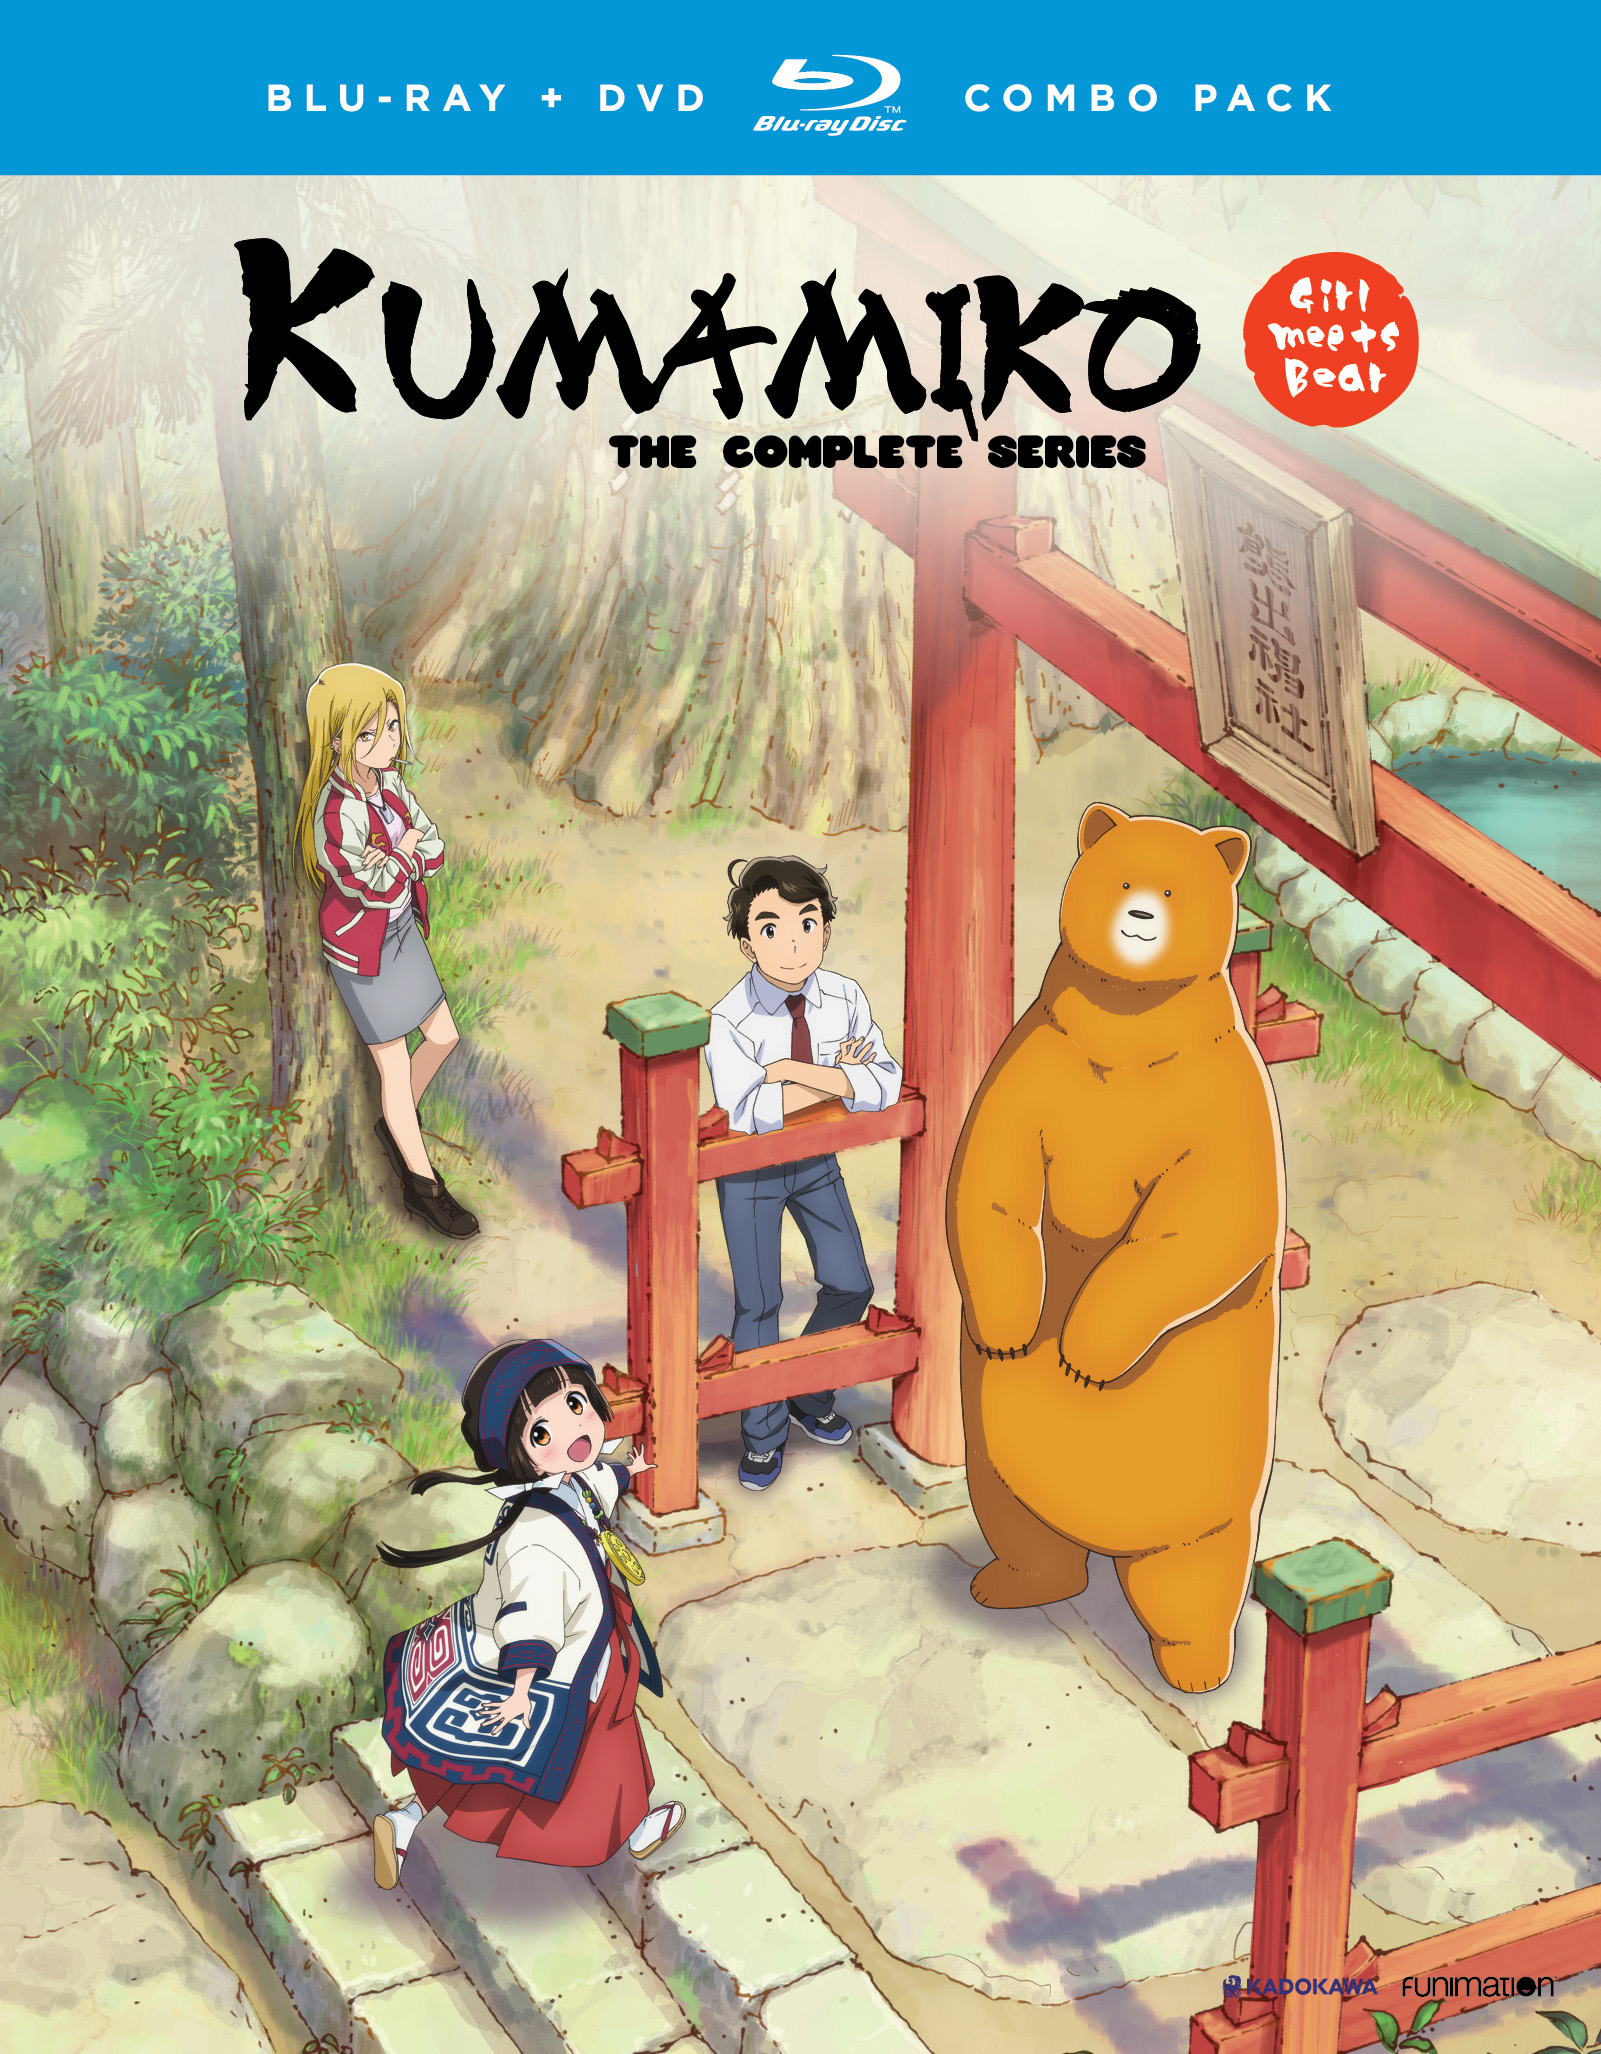 Kumamiko Blu-ray/DVD 704400092961